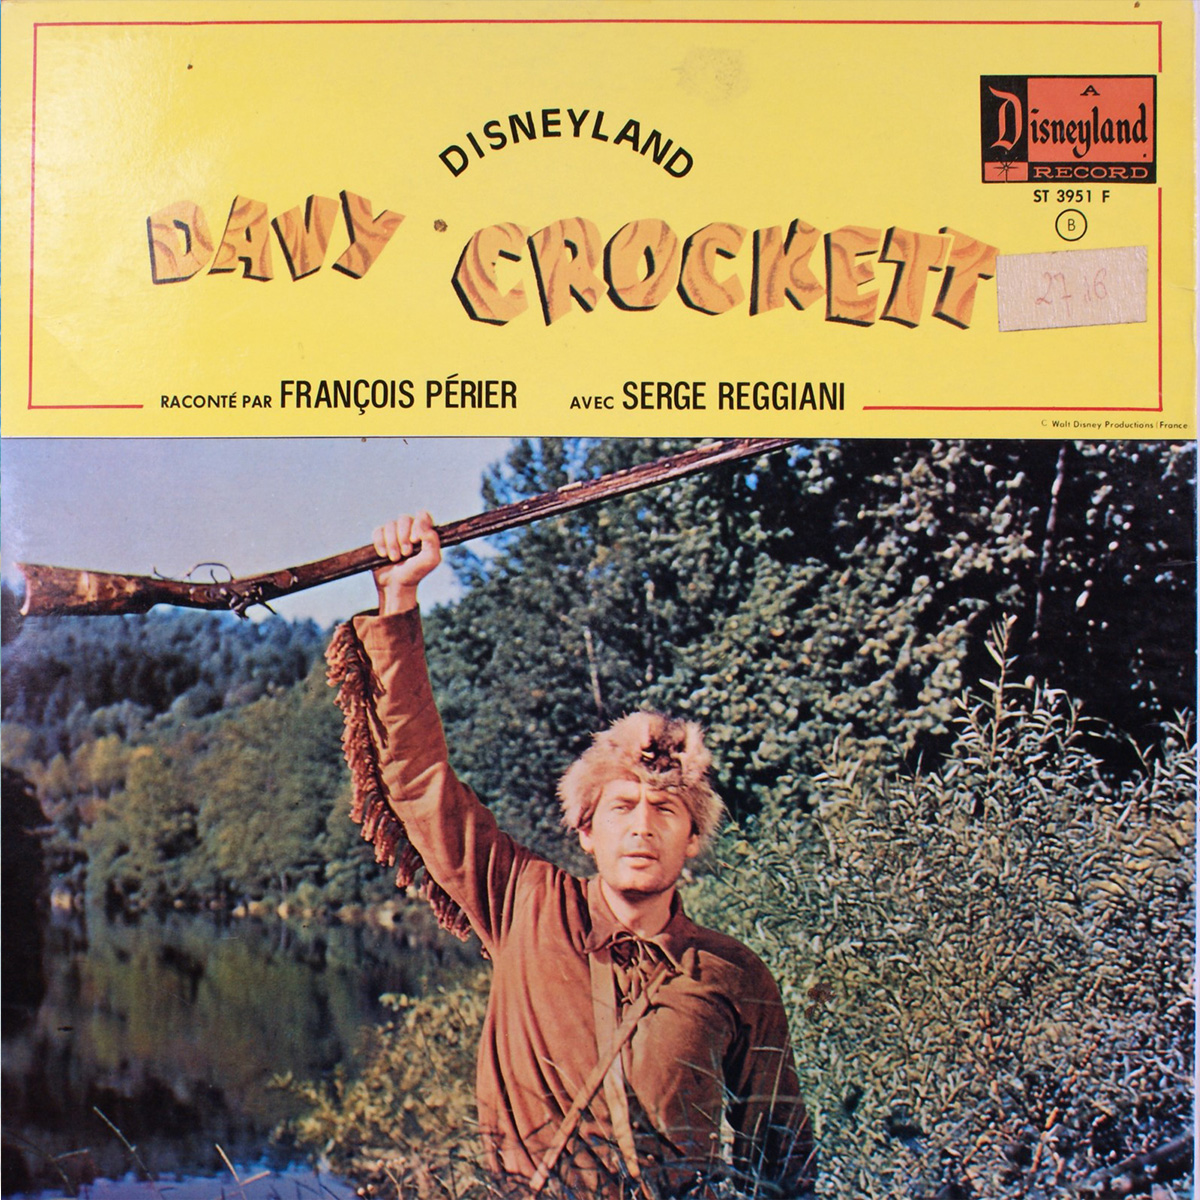 Livre-Disque  Davy Crockett Disneyland Record - Face B